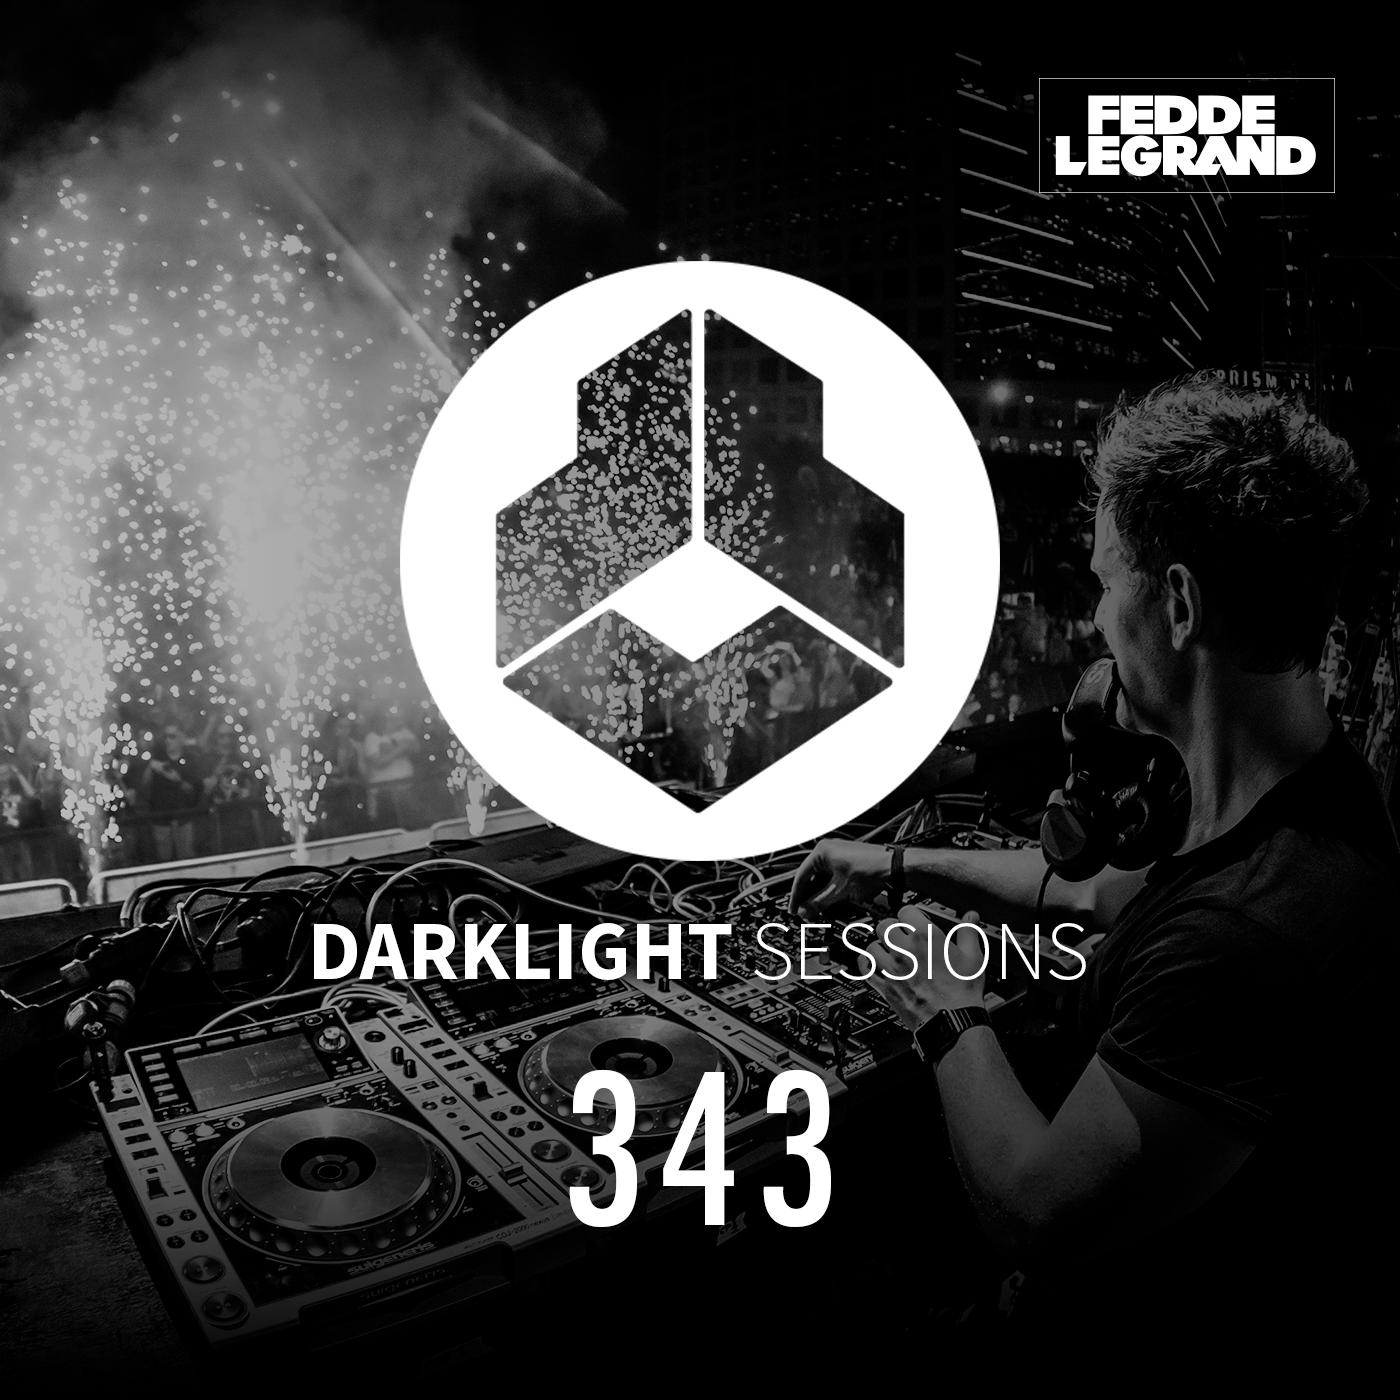 Darklight Sessions 343